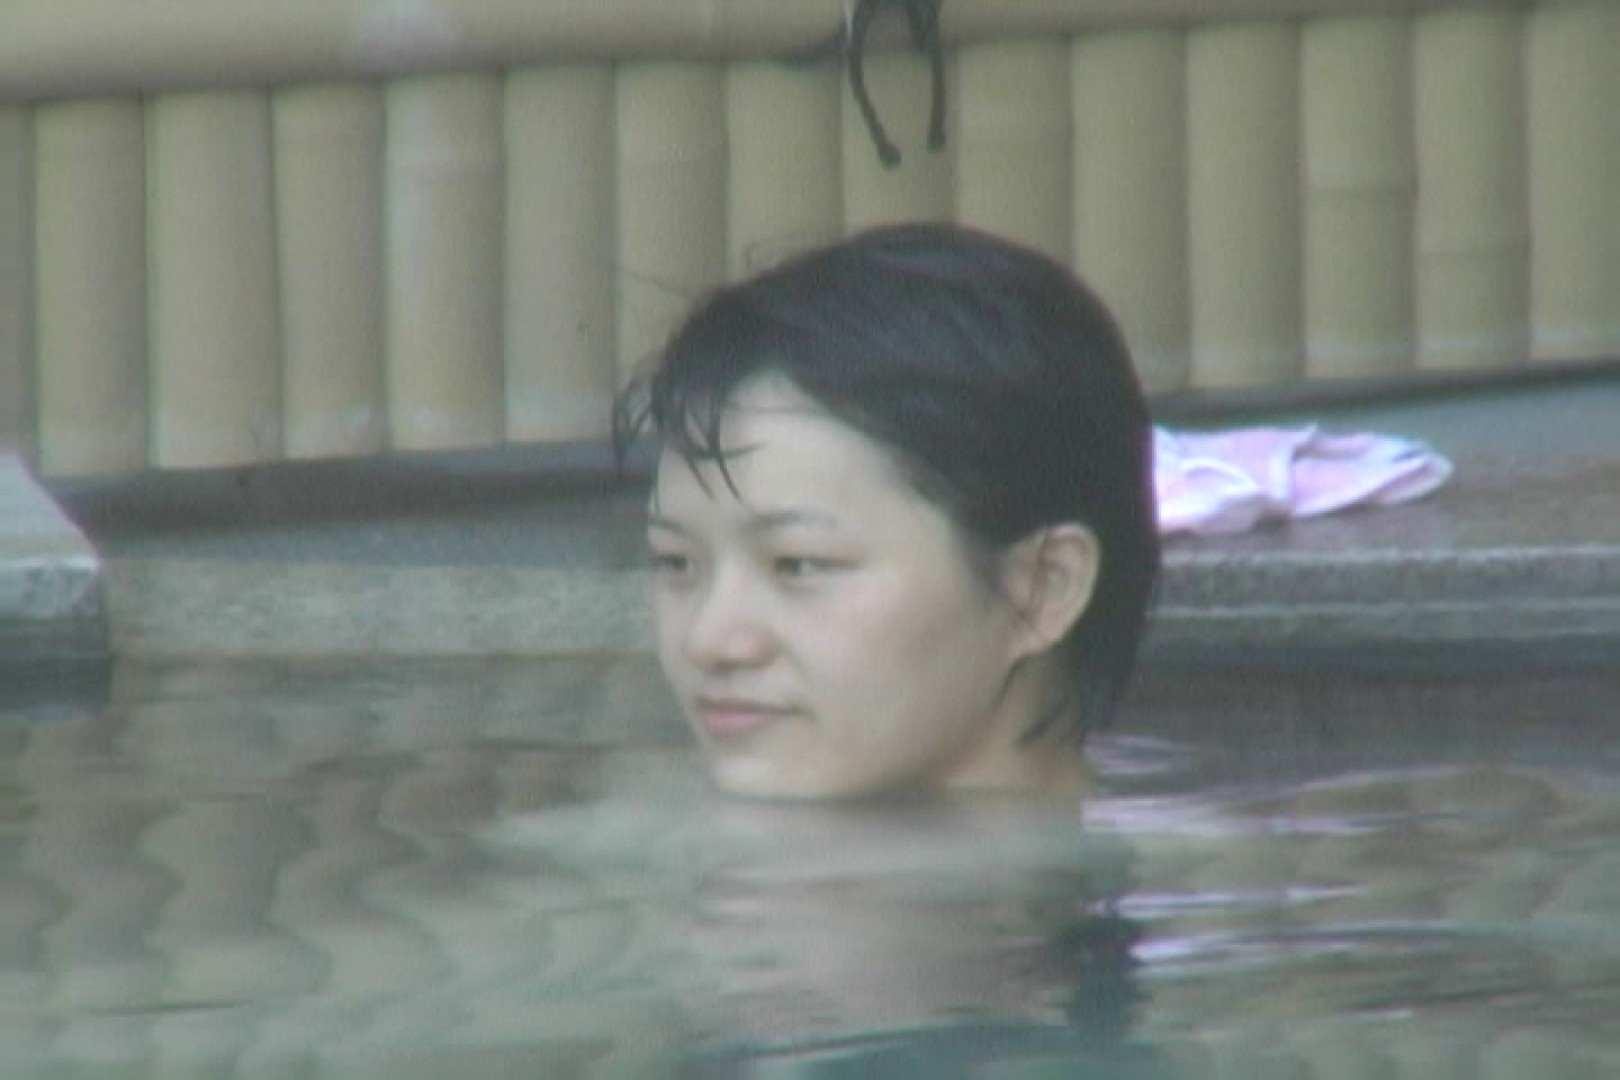 Aquaな露天風呂Vol.116 露天風呂編  107PIX 74